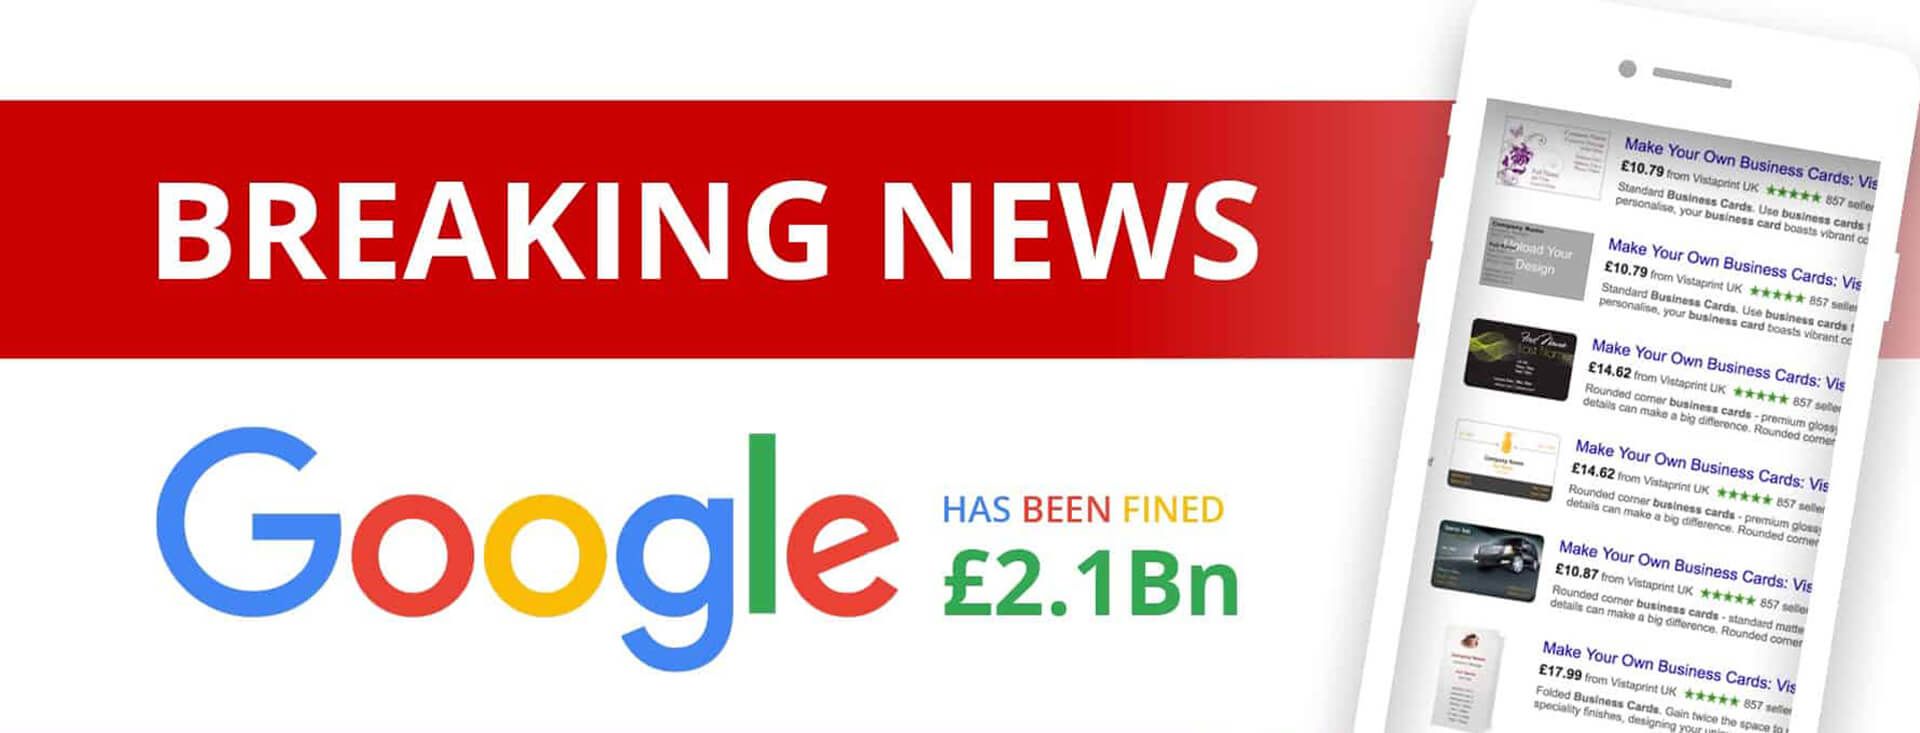 Google fined blog image